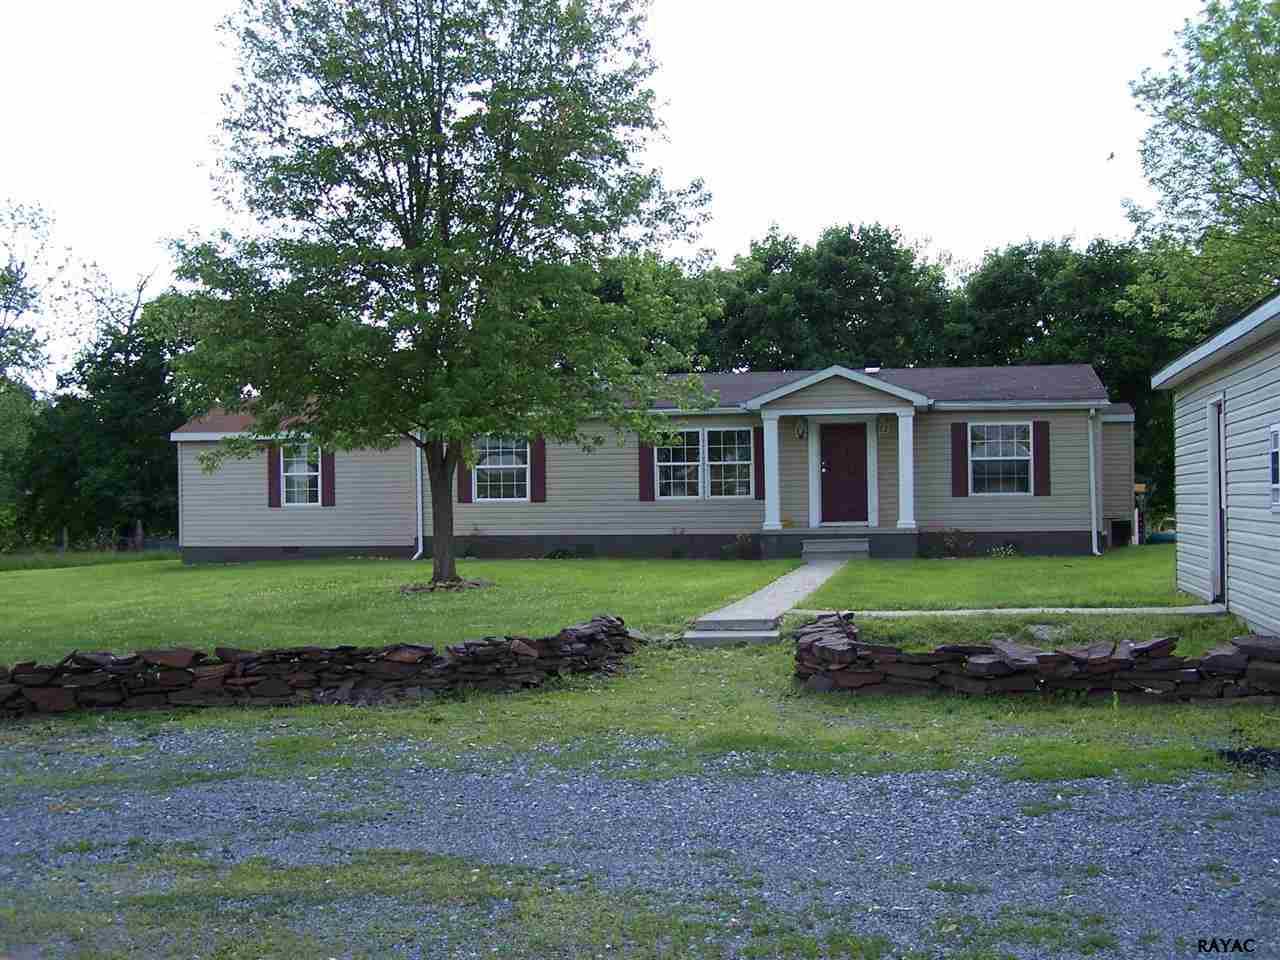 53 Hunterstown Hampton Rd, Gettysburg, PA 17325